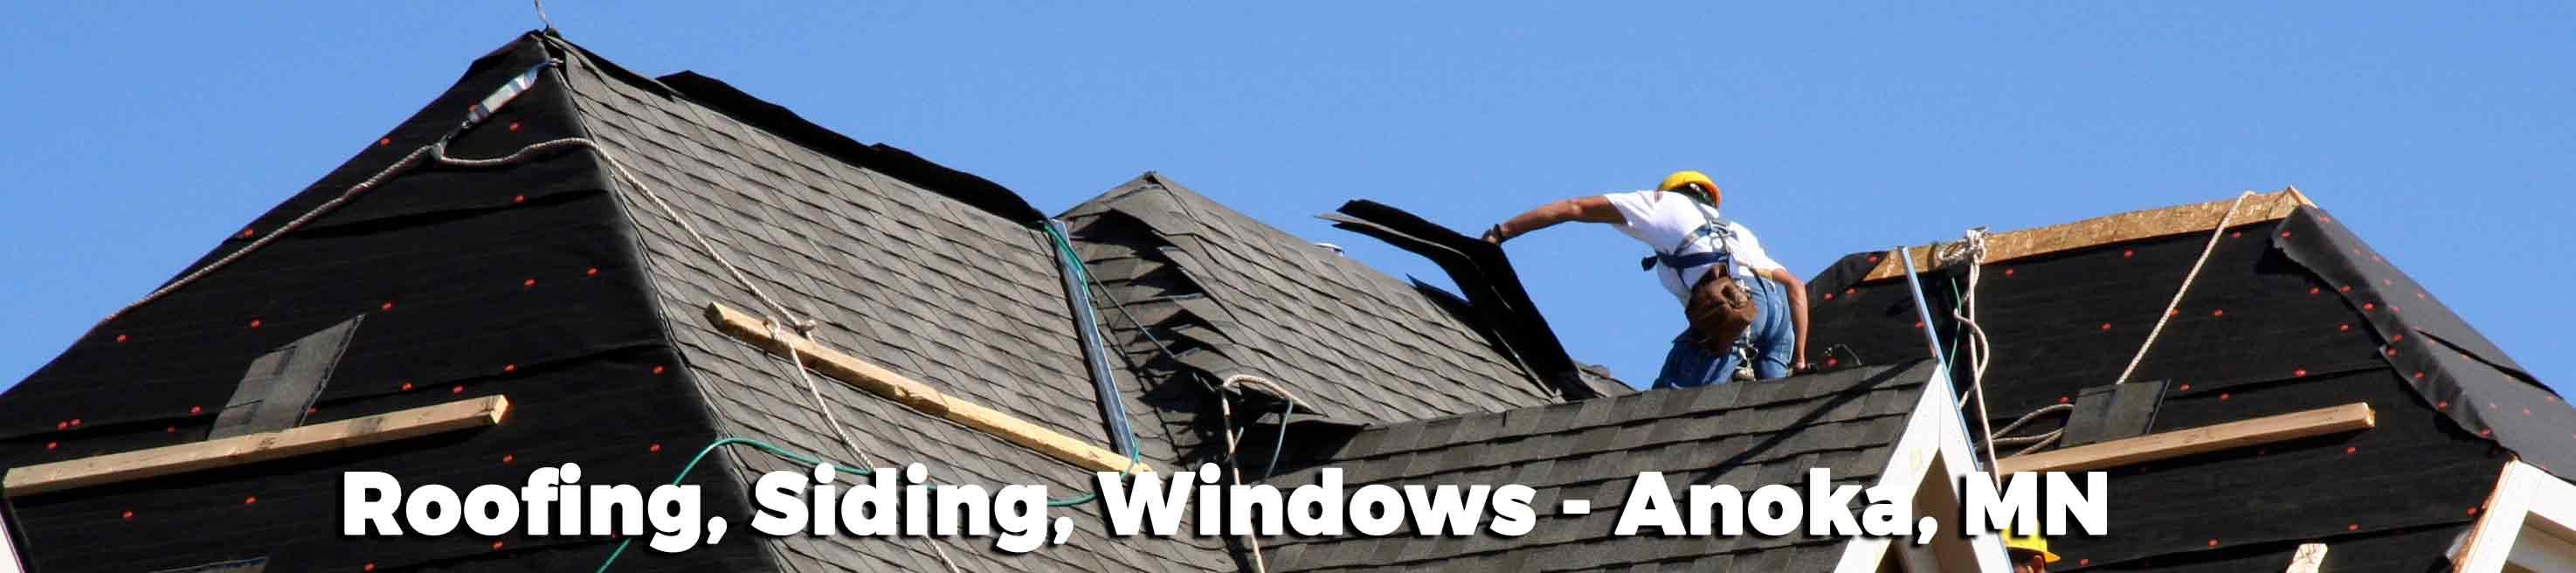 windows-siding-roofing-welter-anoka-mn